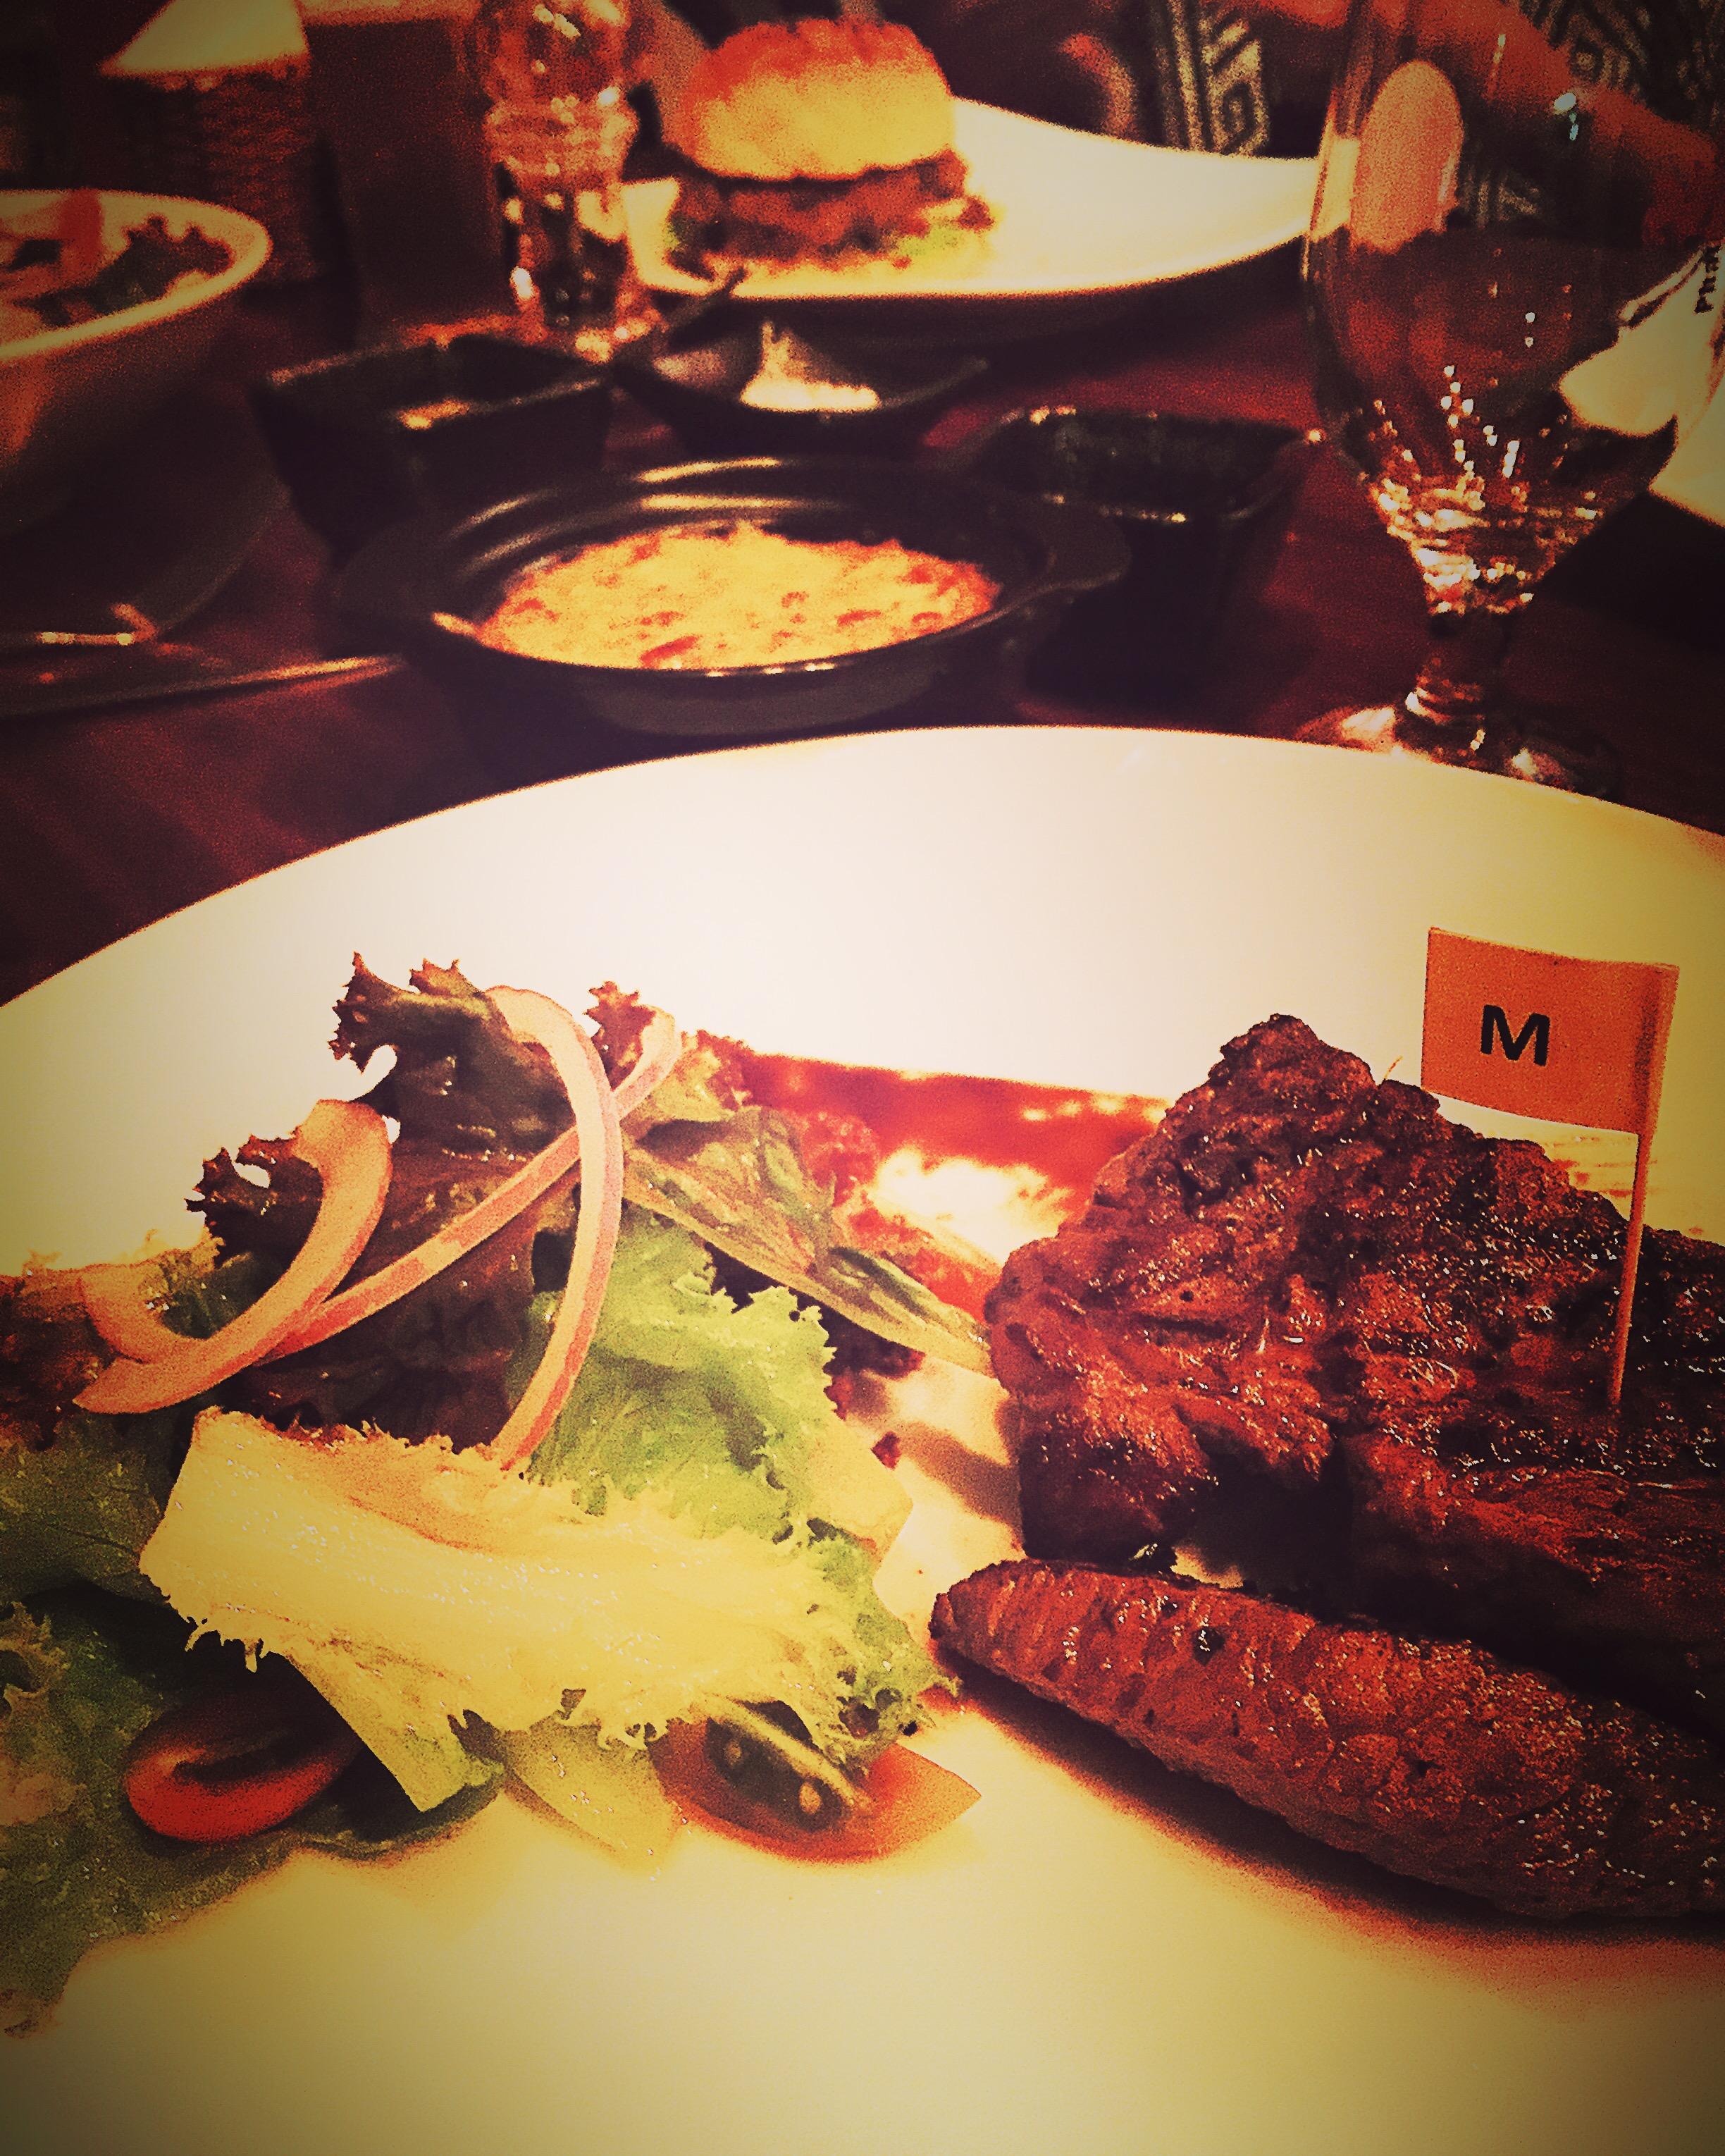 Steak at B3 Nguyen Hue